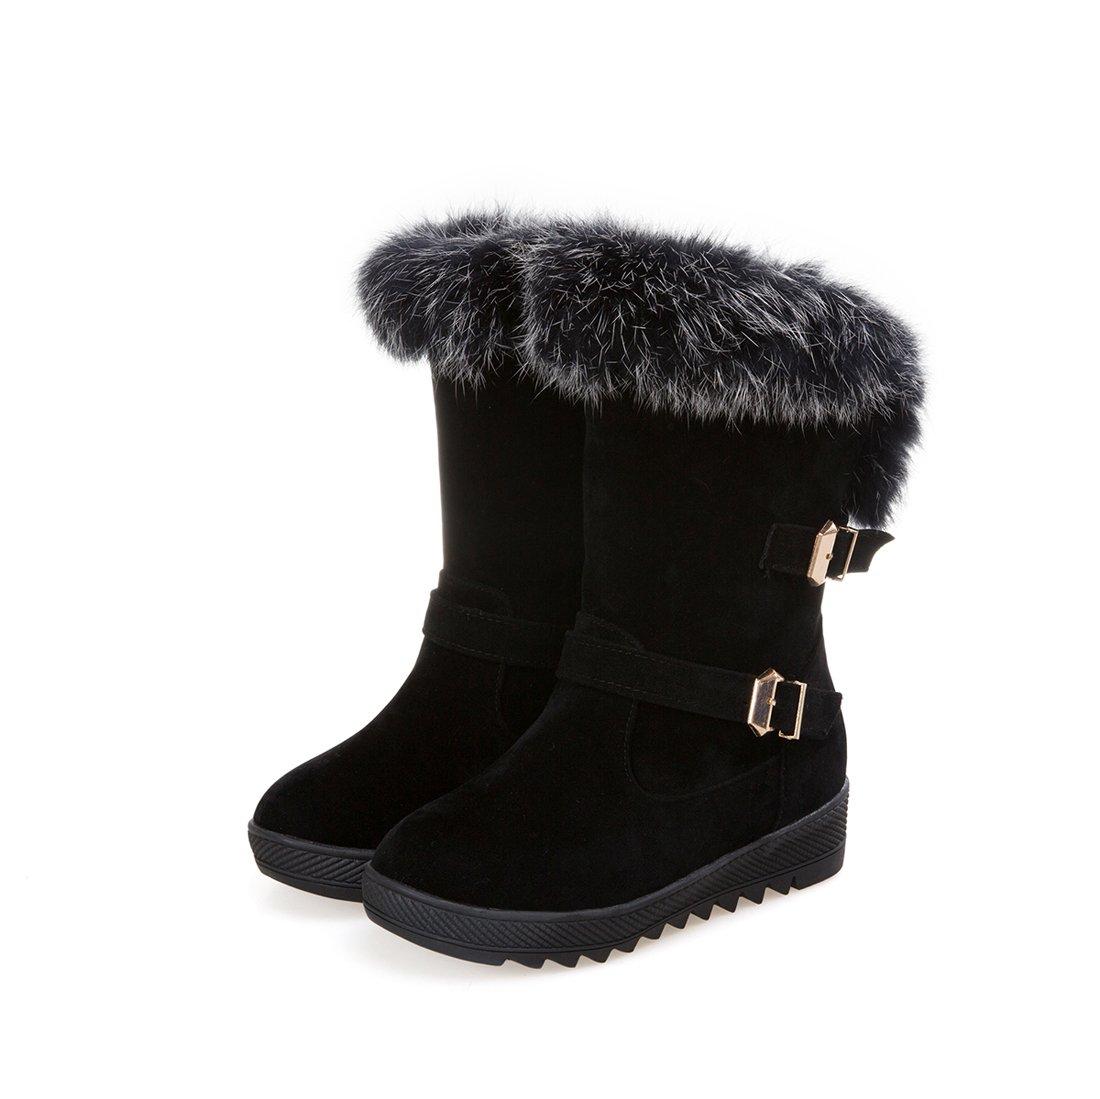 Mostrin Women's Round Toe Platform Short Boots Winter Faux Fur Buckle Waterproof Warm Snow Boots